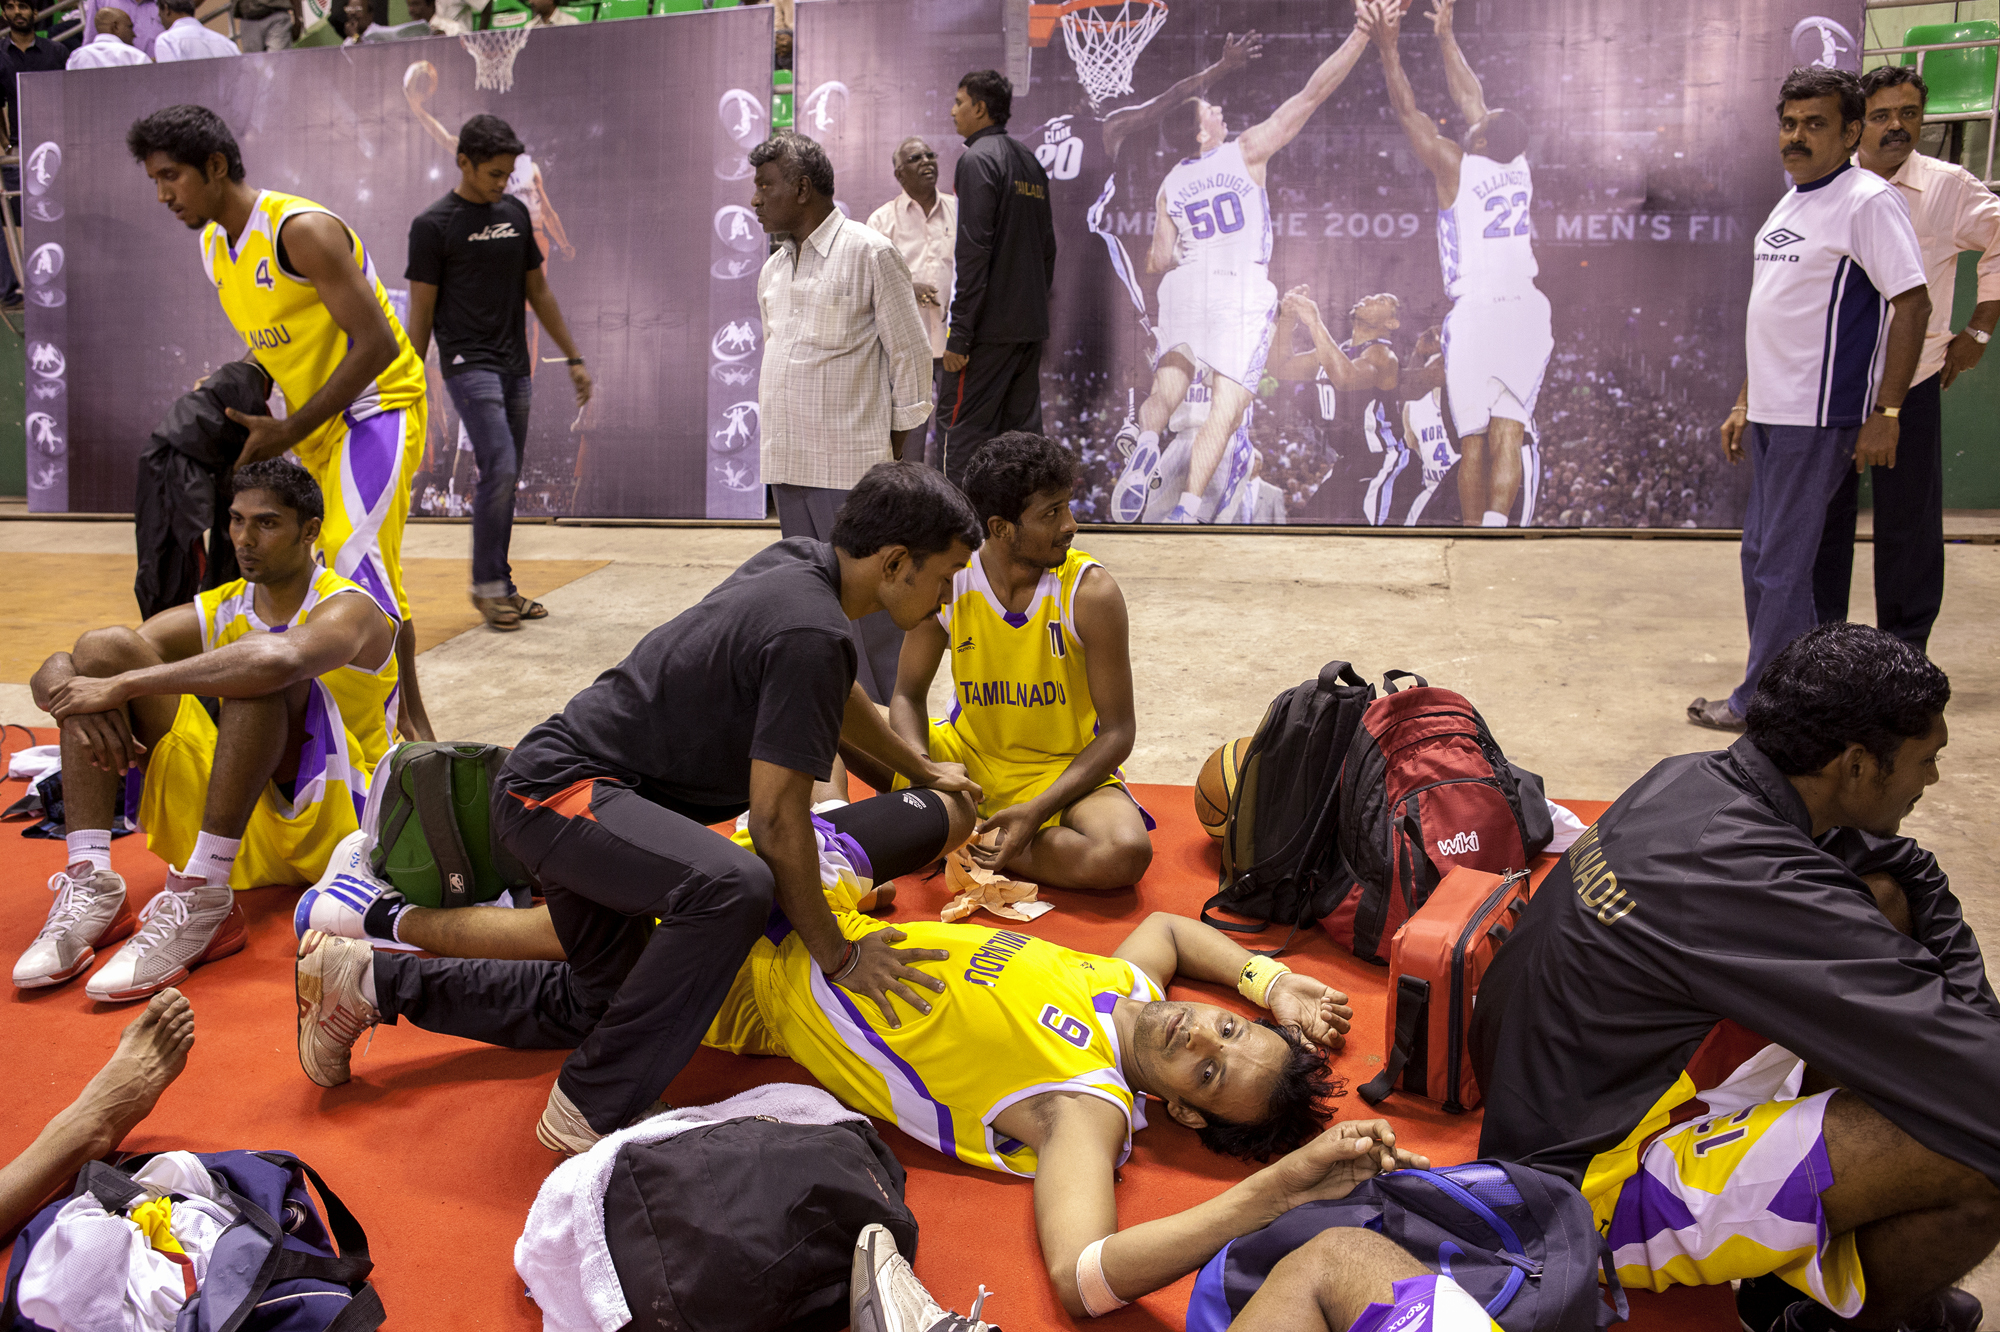 Tamil Nadu team pre game stretch at the 62nd Senior National Basketball Championship, Chennai, Tamil Nadu, 2011.